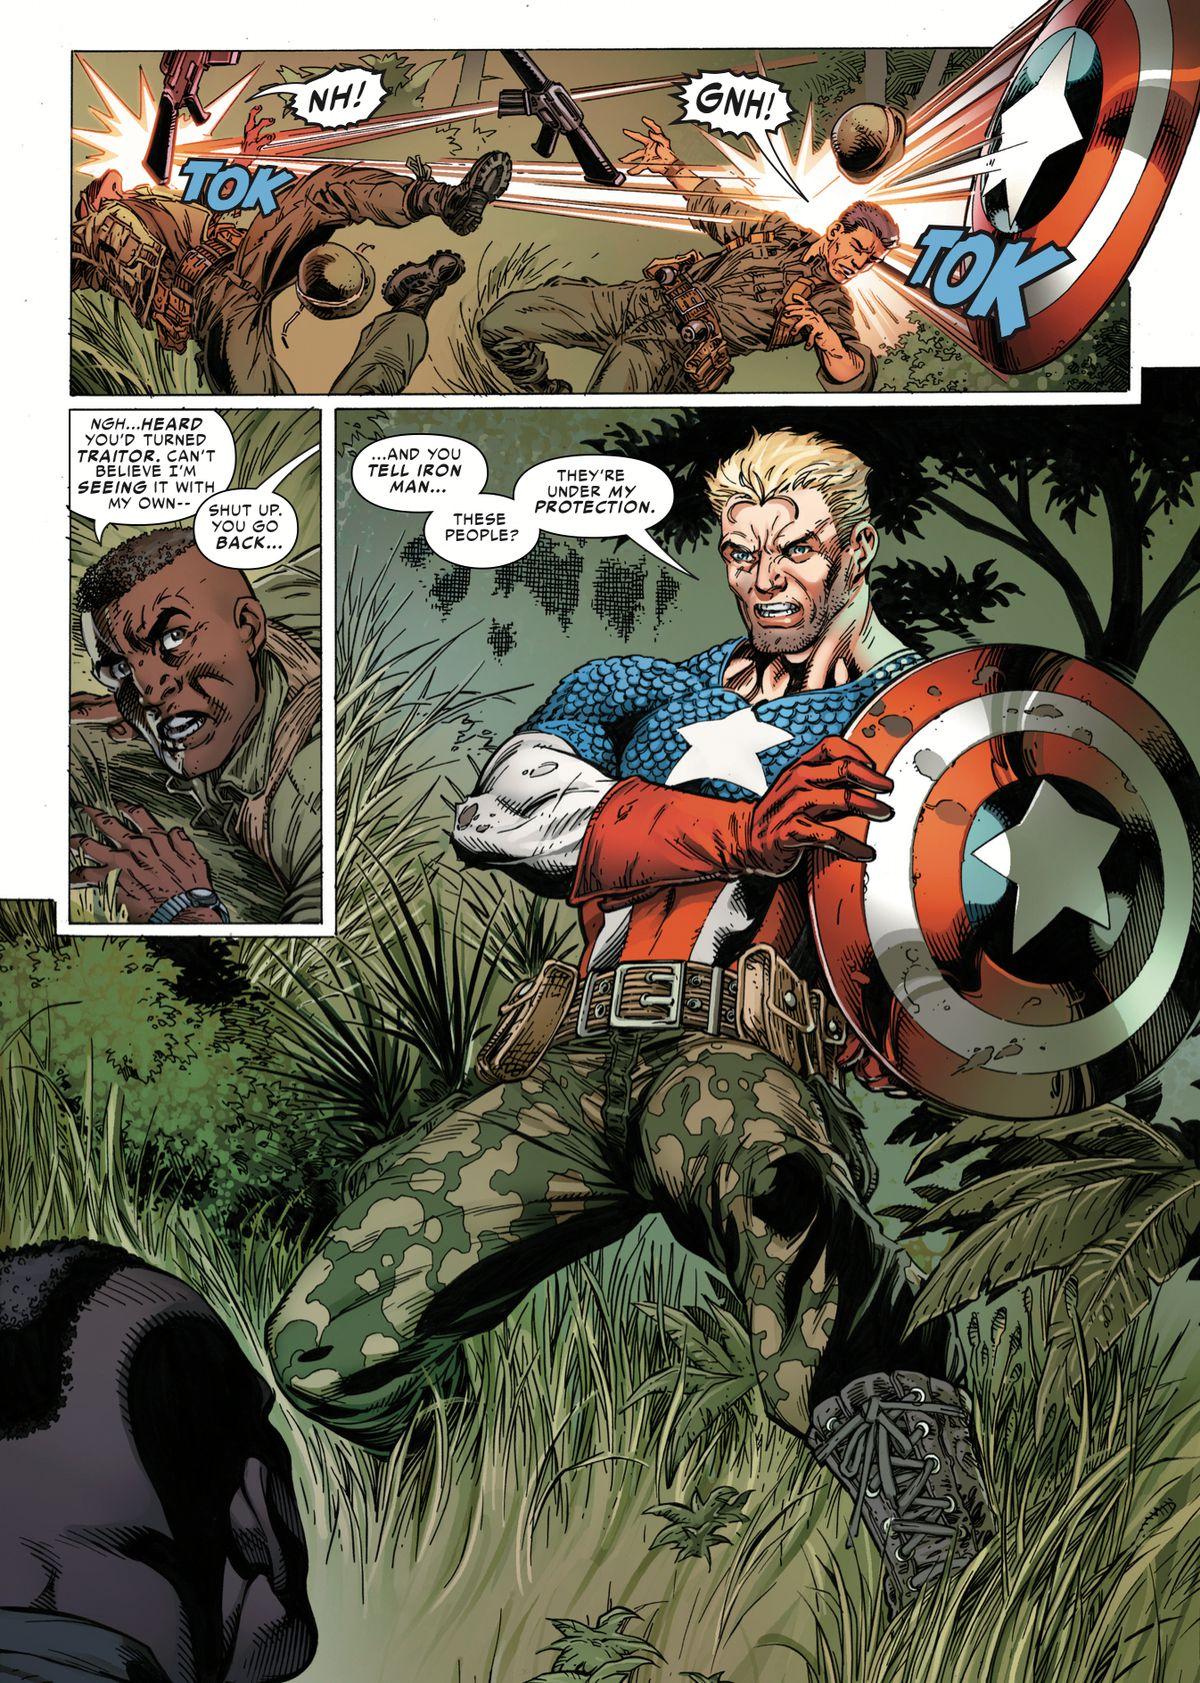 Spider-Man: Life Story #1, Marvel Comics (2019).